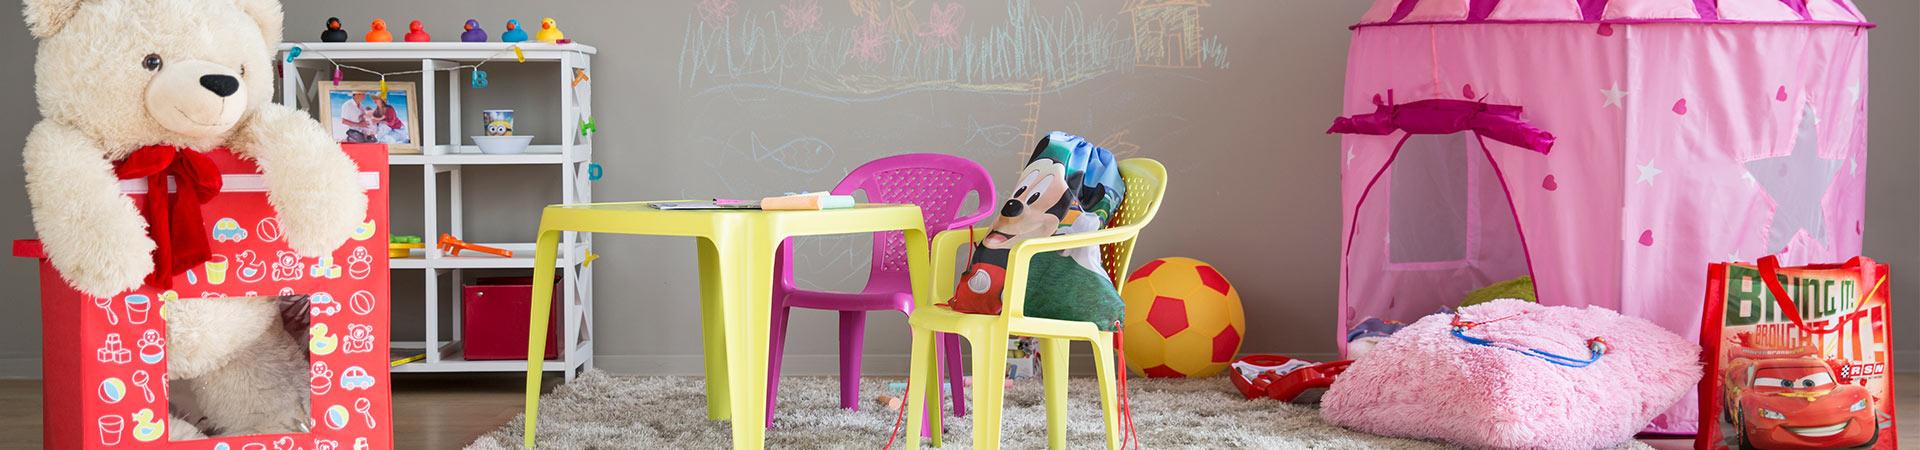 Bērnu preces un rotaļlietas